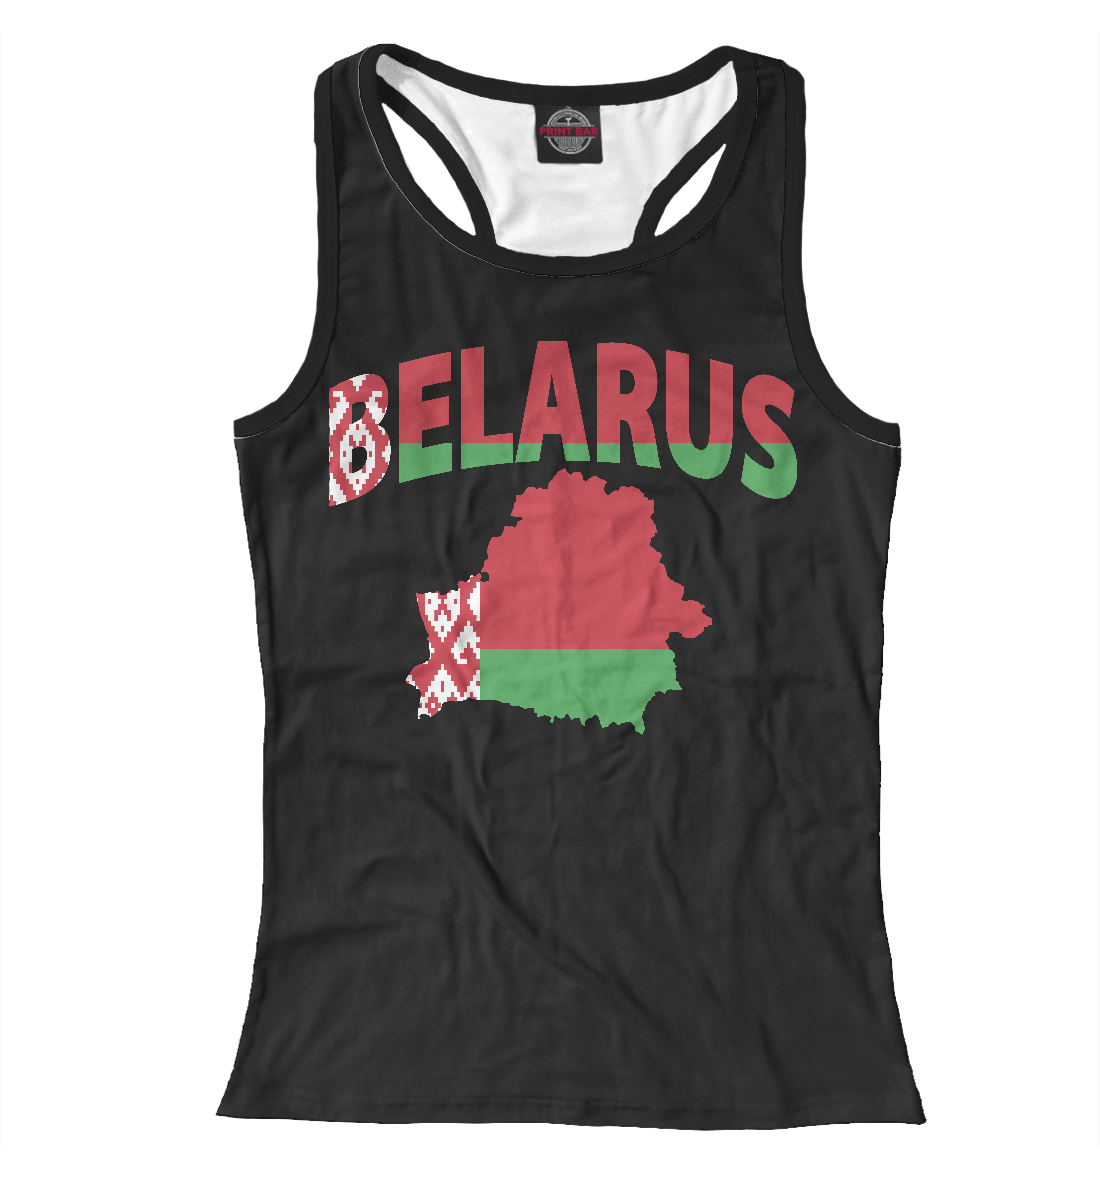 Купить Беларусь, Printbar, Майки борцовки, BLR-164802-mayb-1